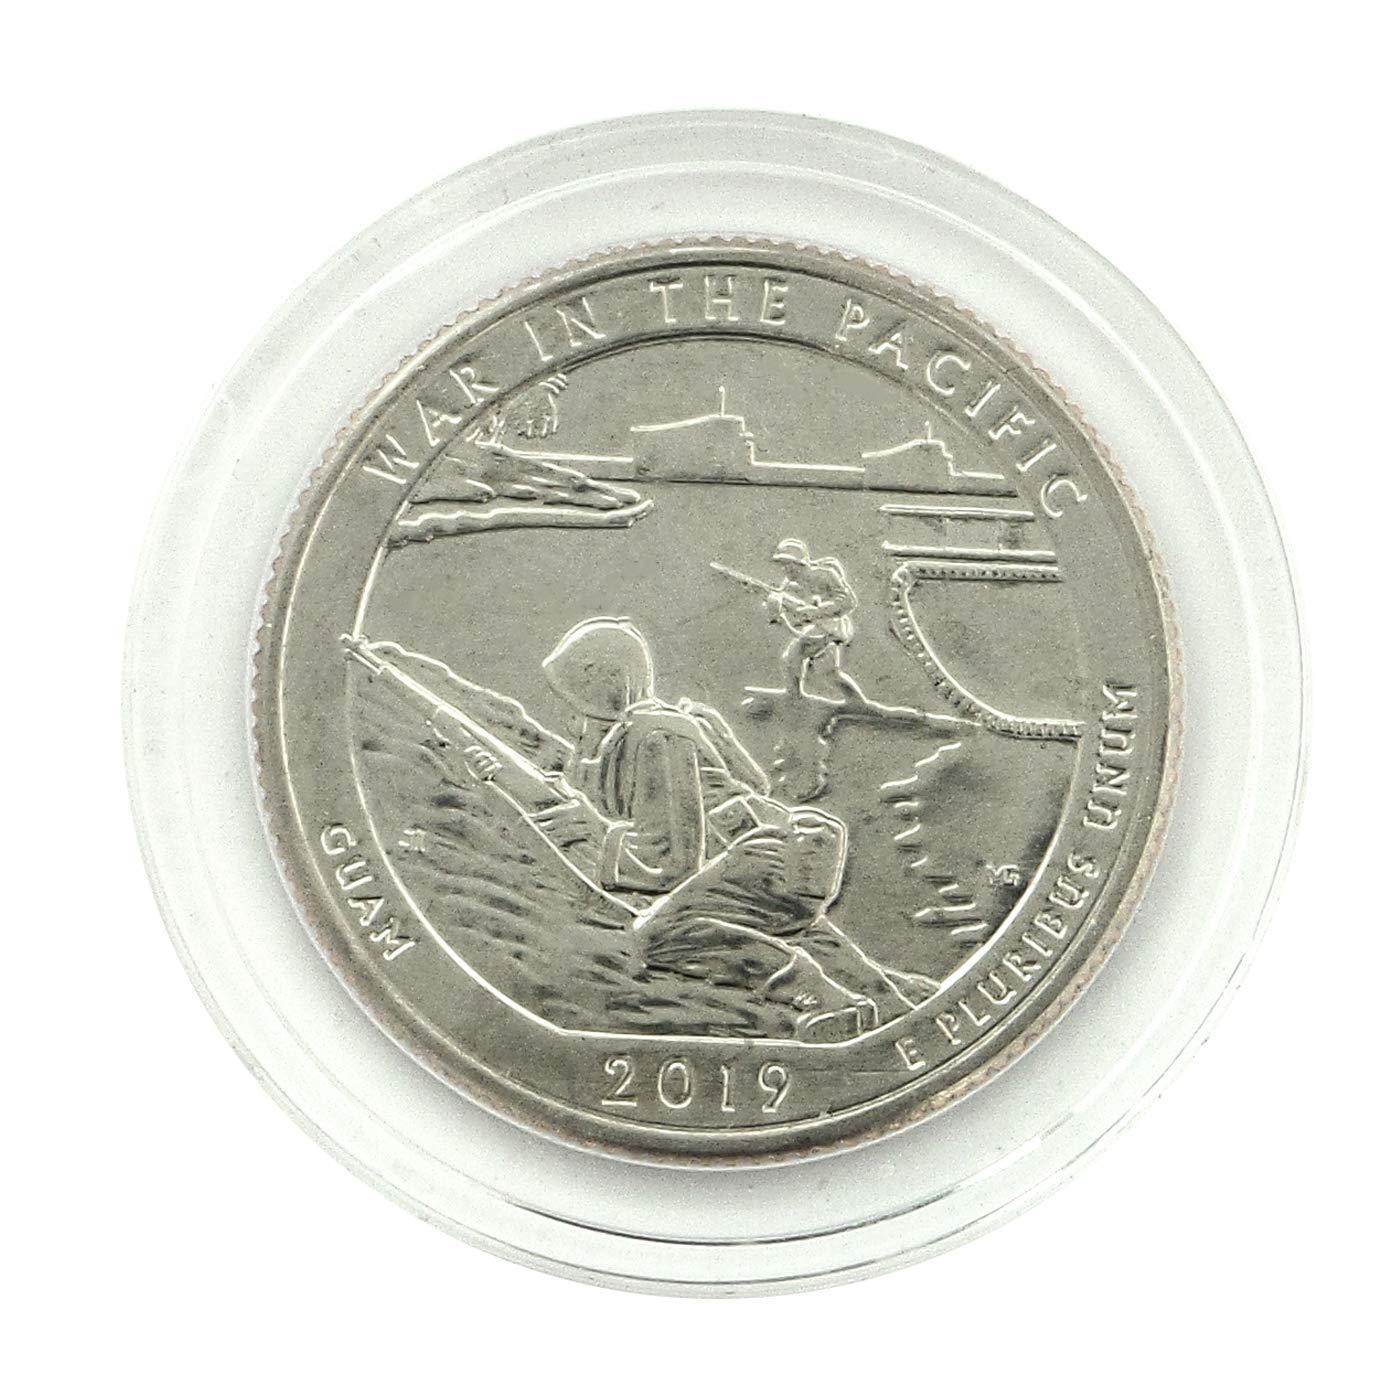 2019 West Point Quarter complete 5 coin set